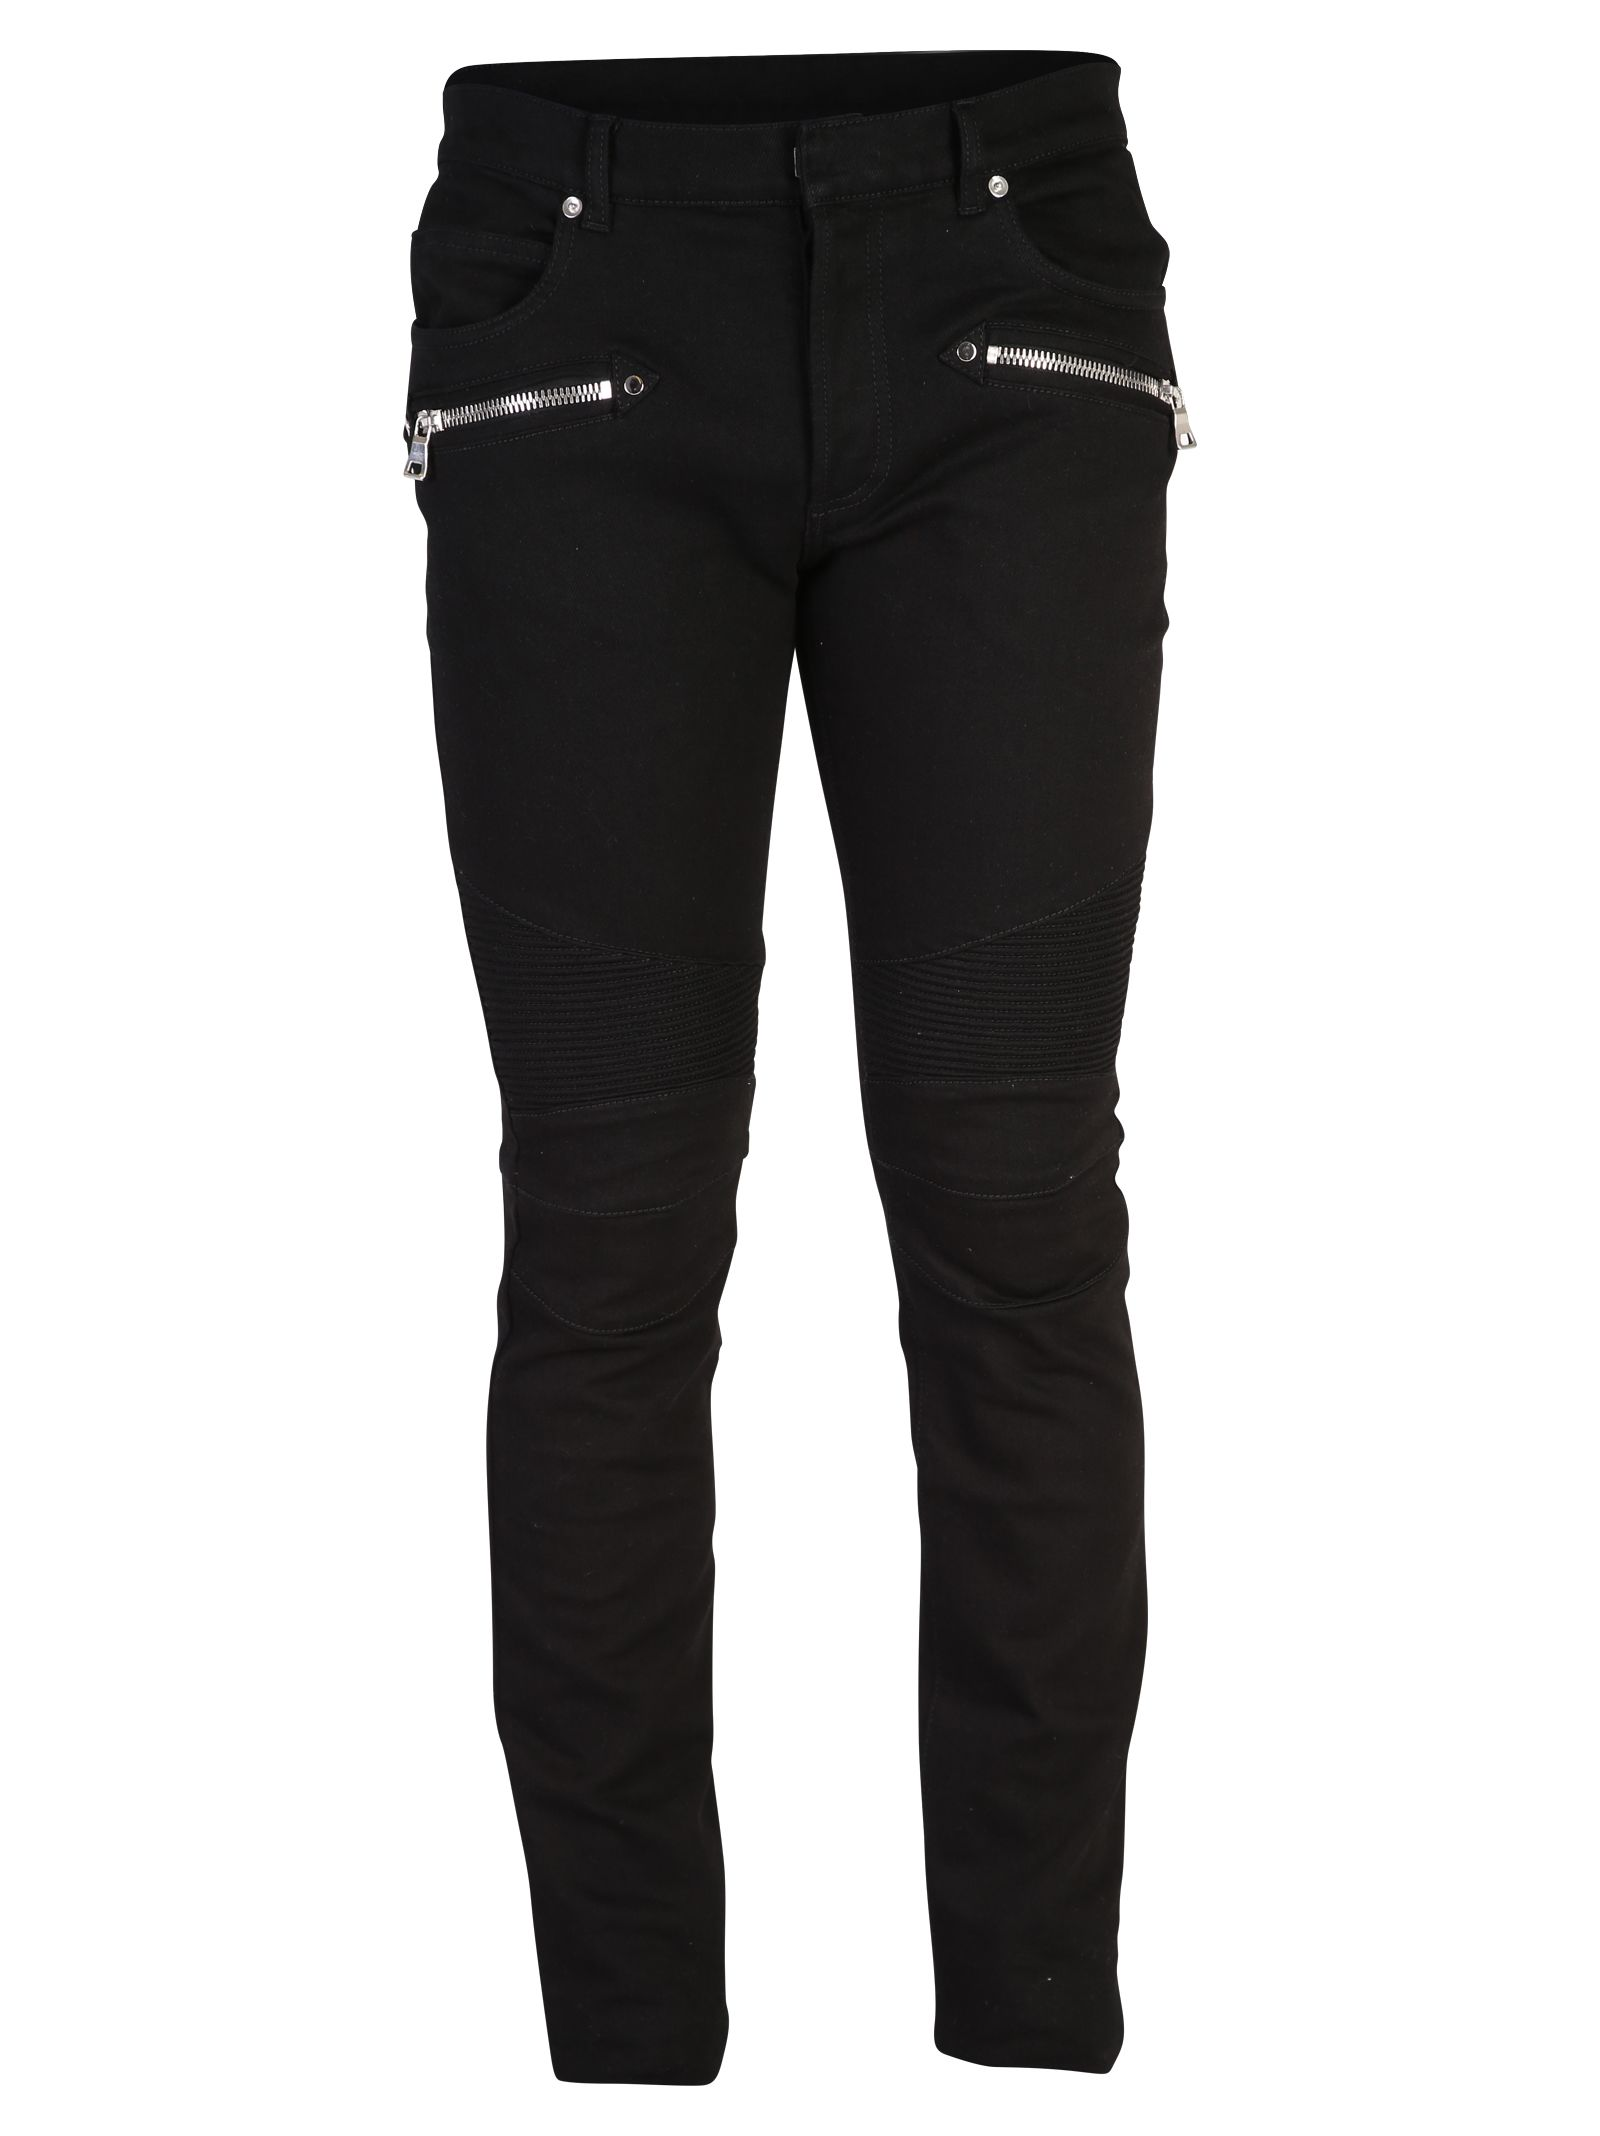 Black Biker Jeans 10604135